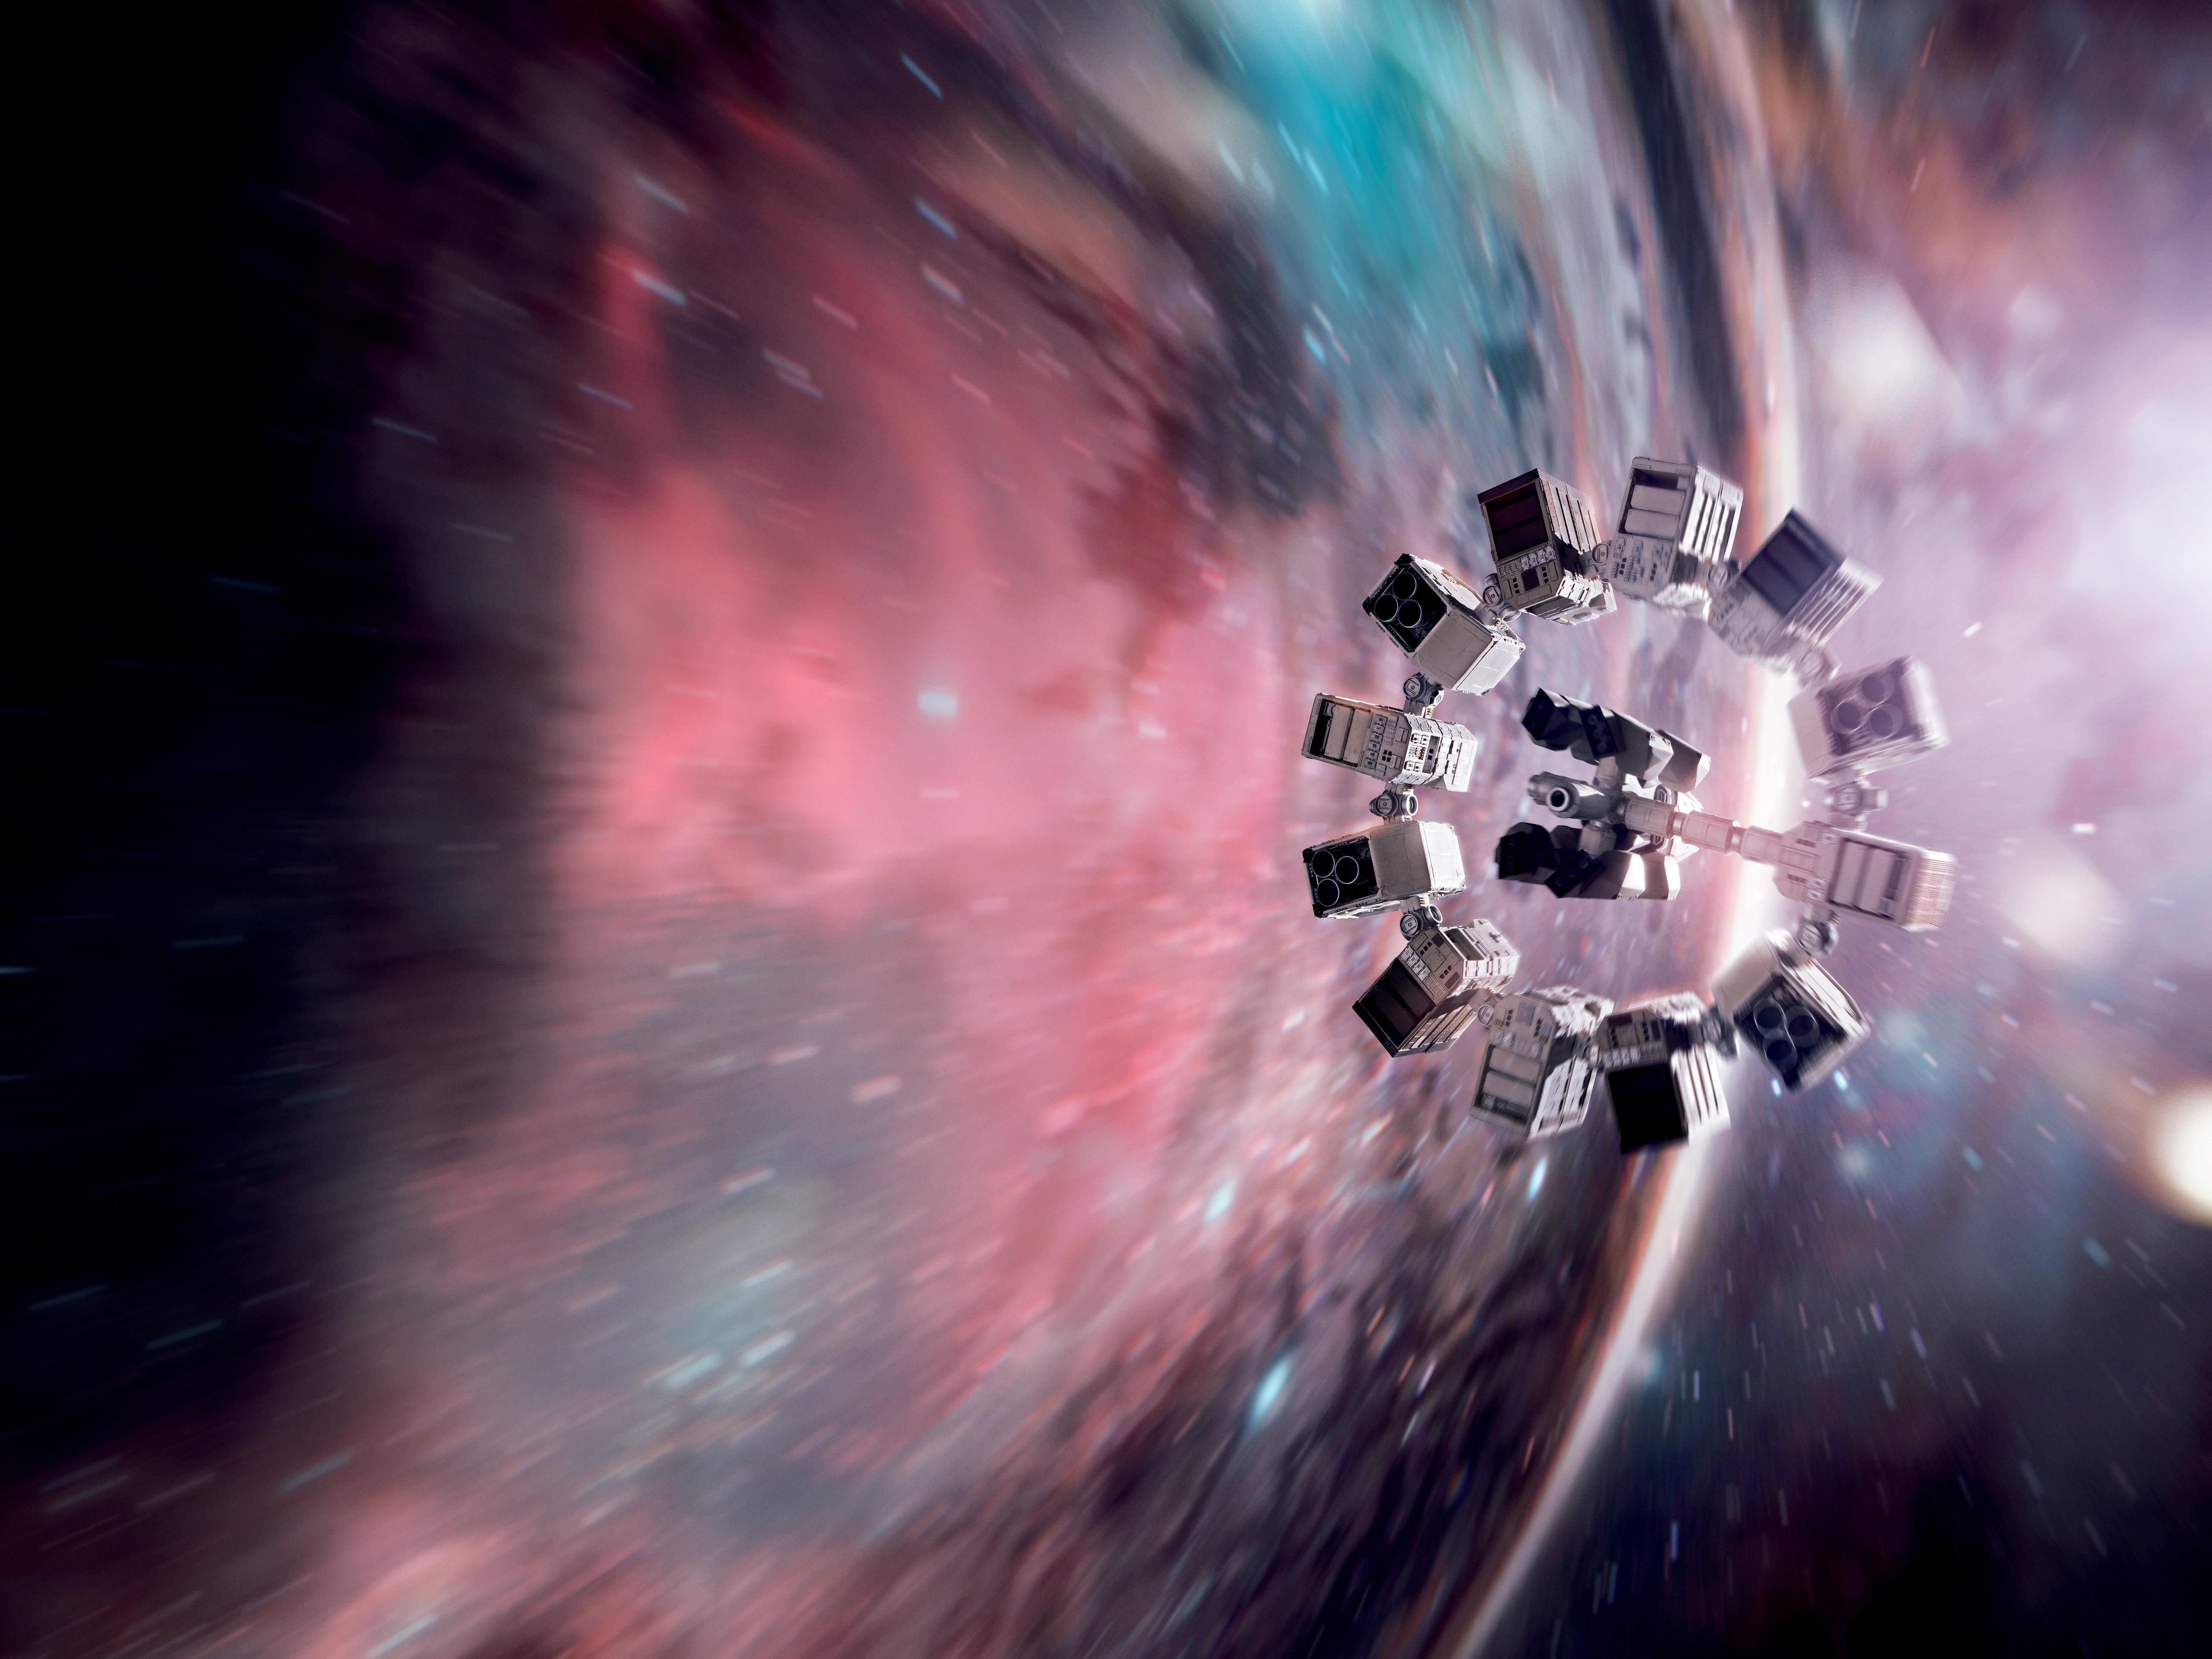 Interstellar 4k Wallpapers For Your Desktop Or Mobile Screen